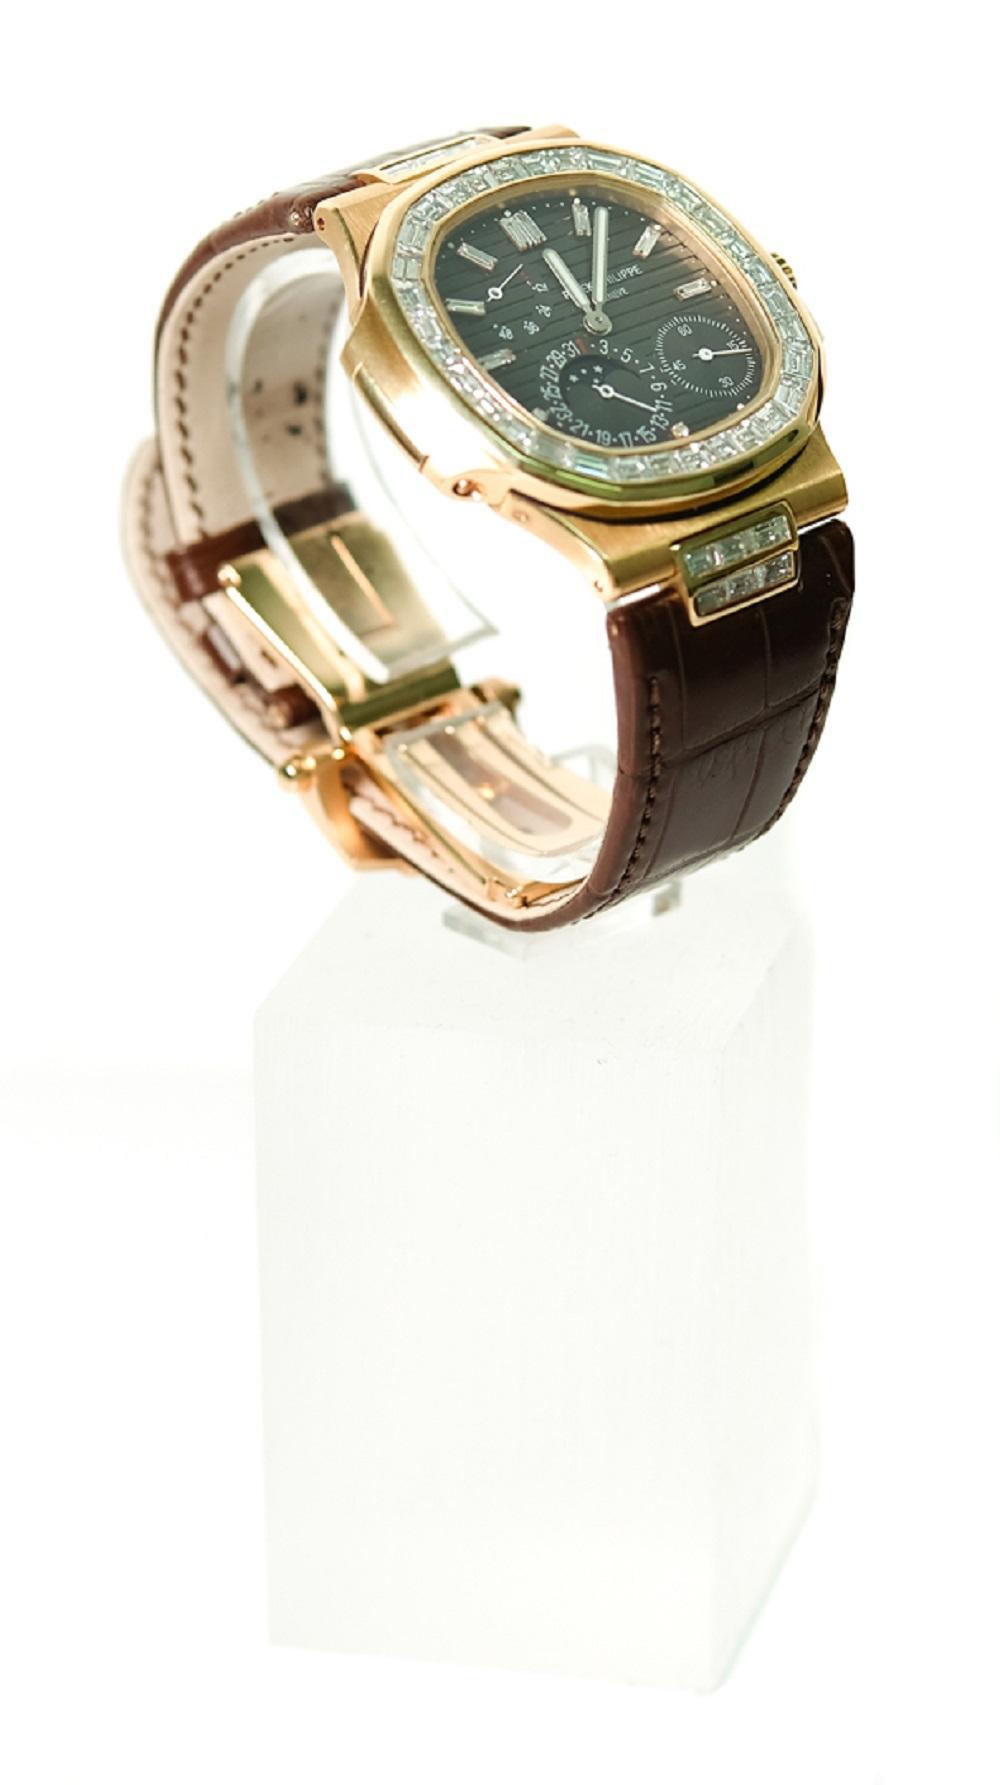 Patek Philippe 52724G Nautilus Self-Winding Watch